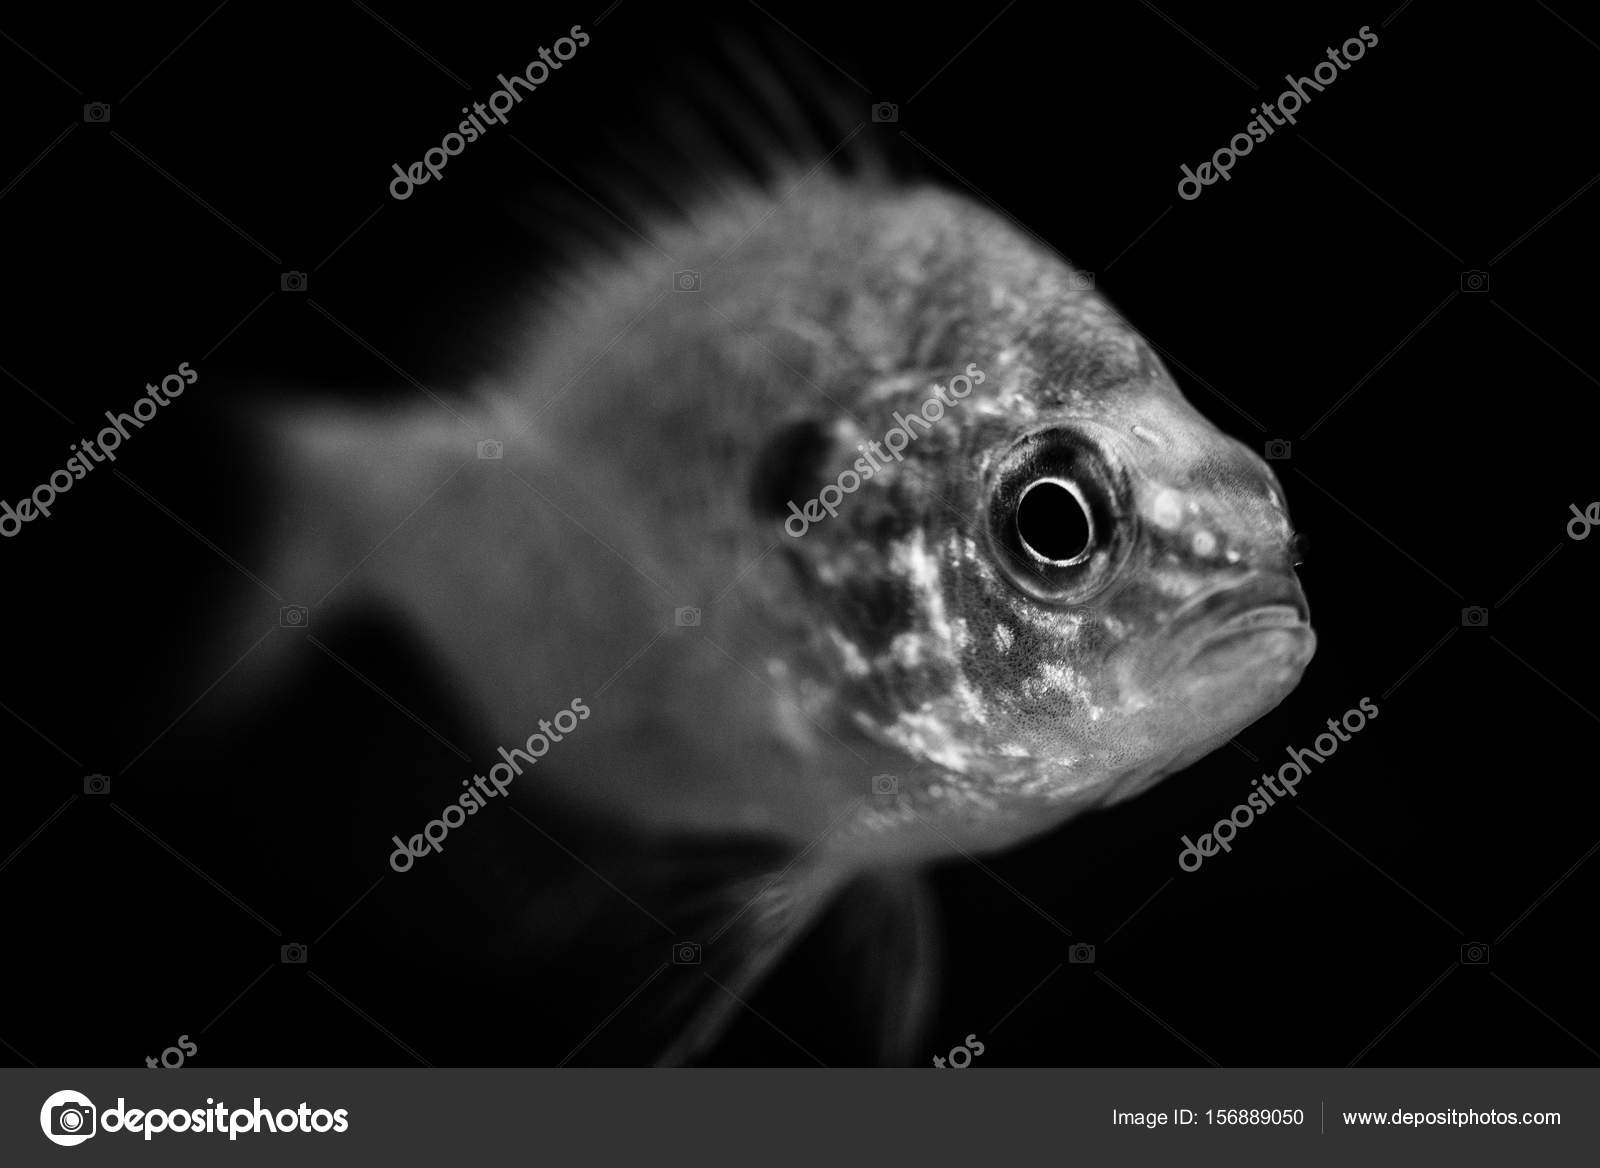 Fish black and white animals portraits stock photo